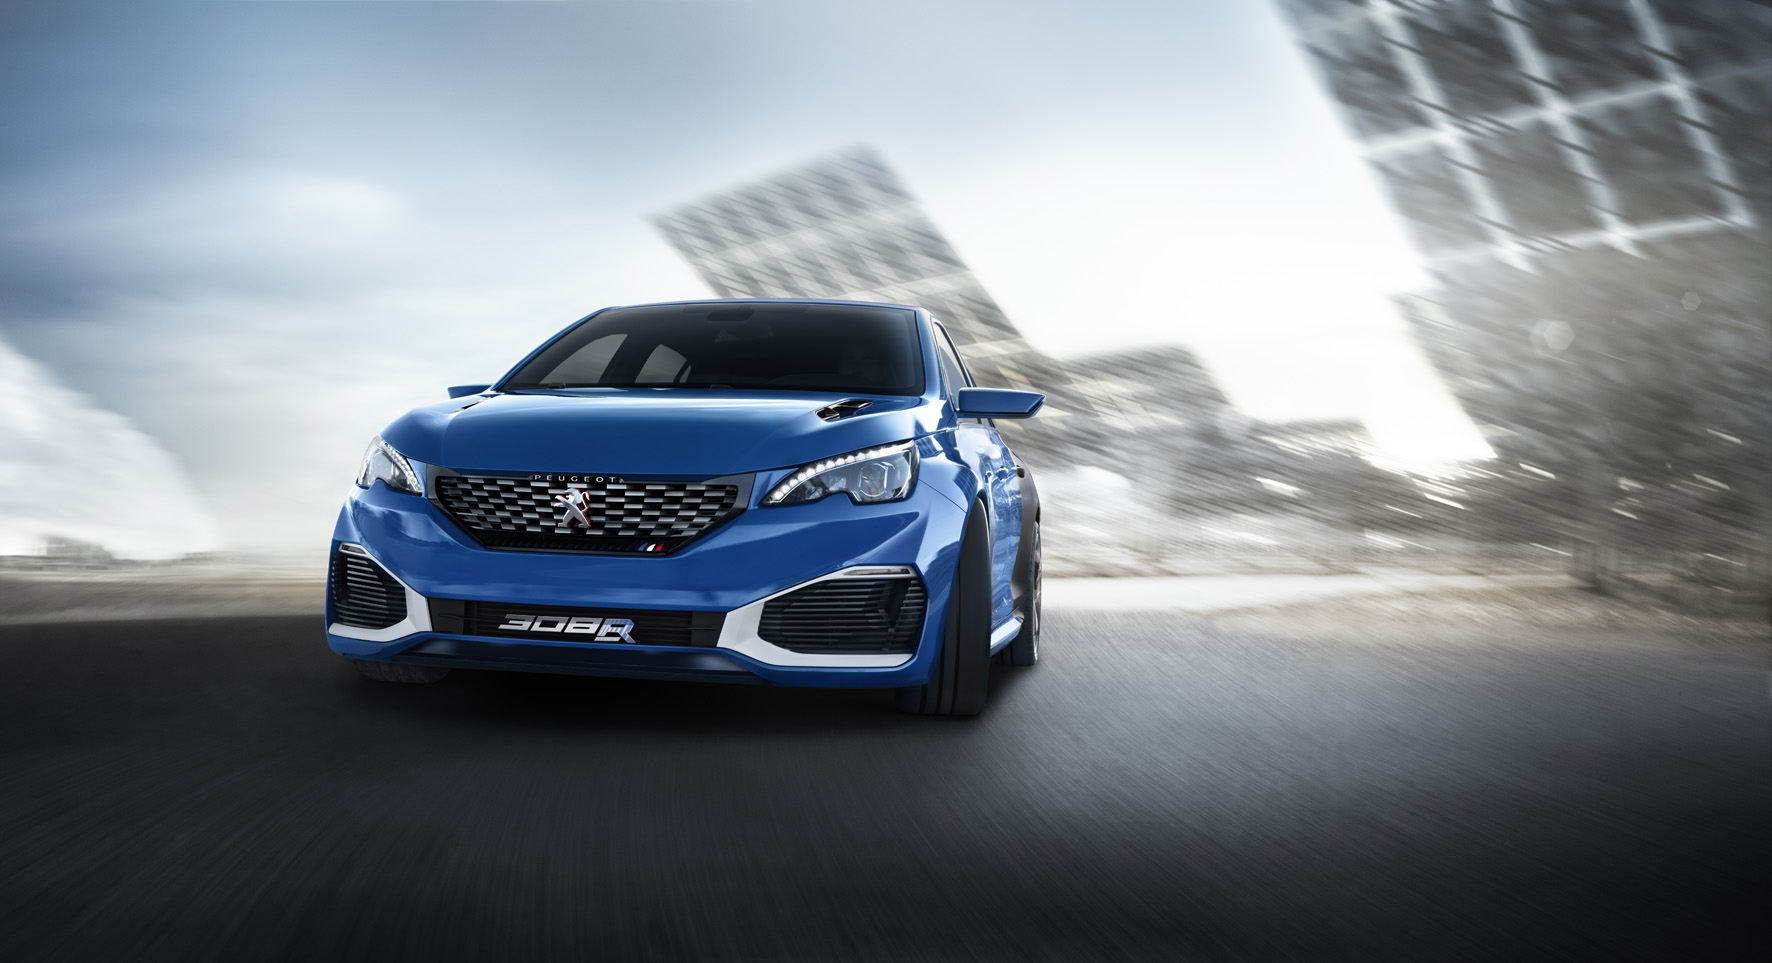 Peugeot-presente-la-308-R-Hybrid-4-2015-4